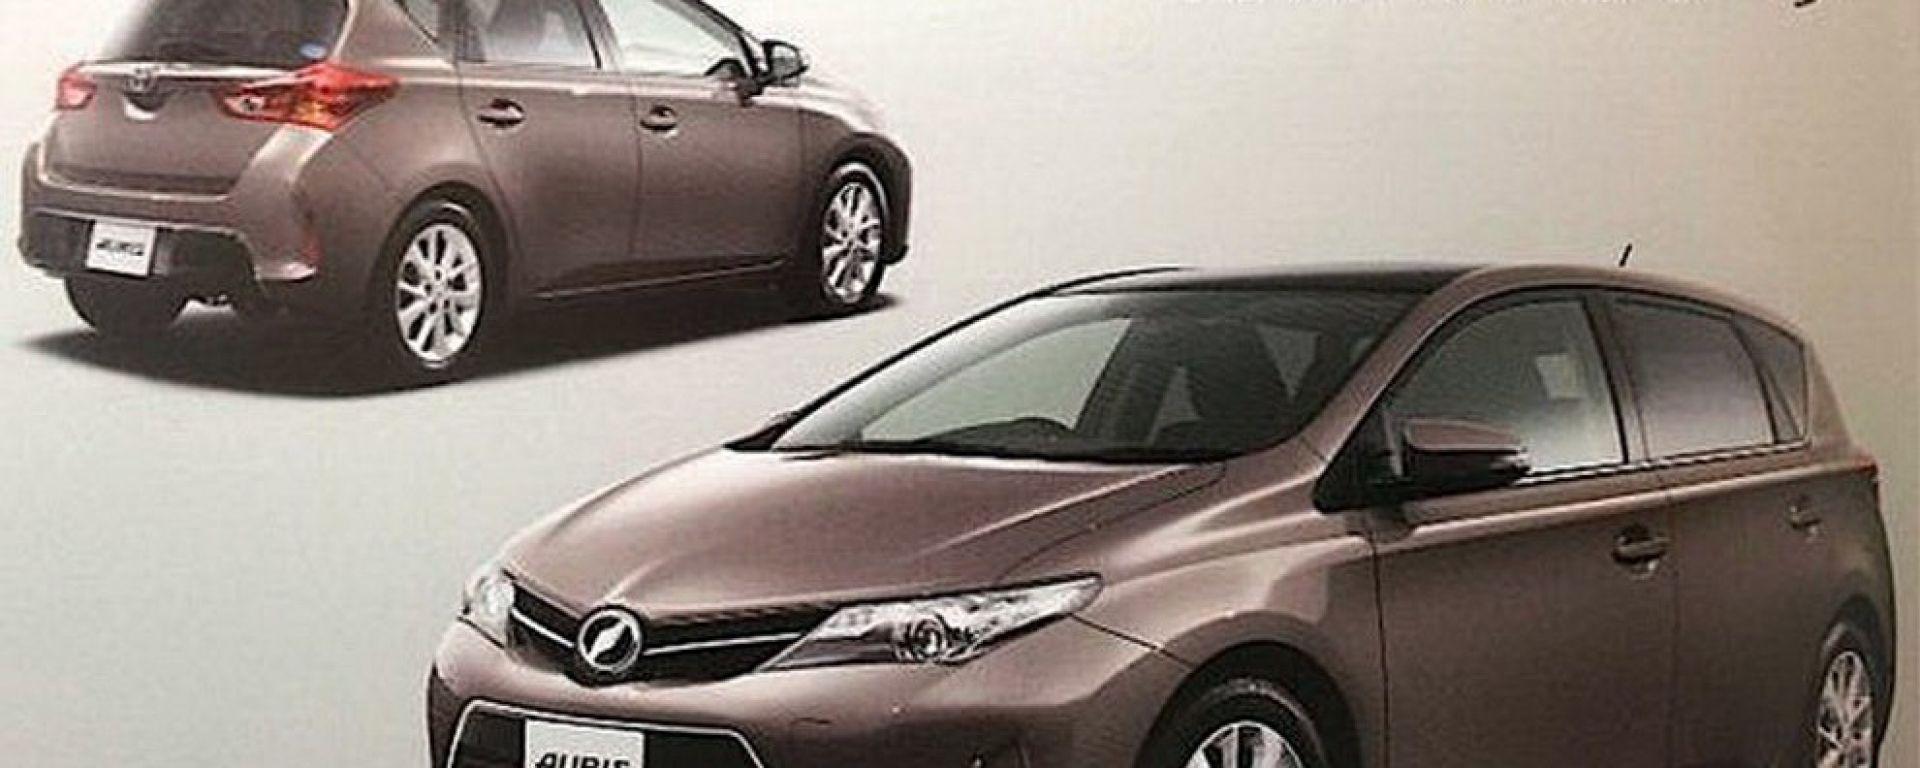 "Toyota Auris 2013, nuove immagini ""rubate"""